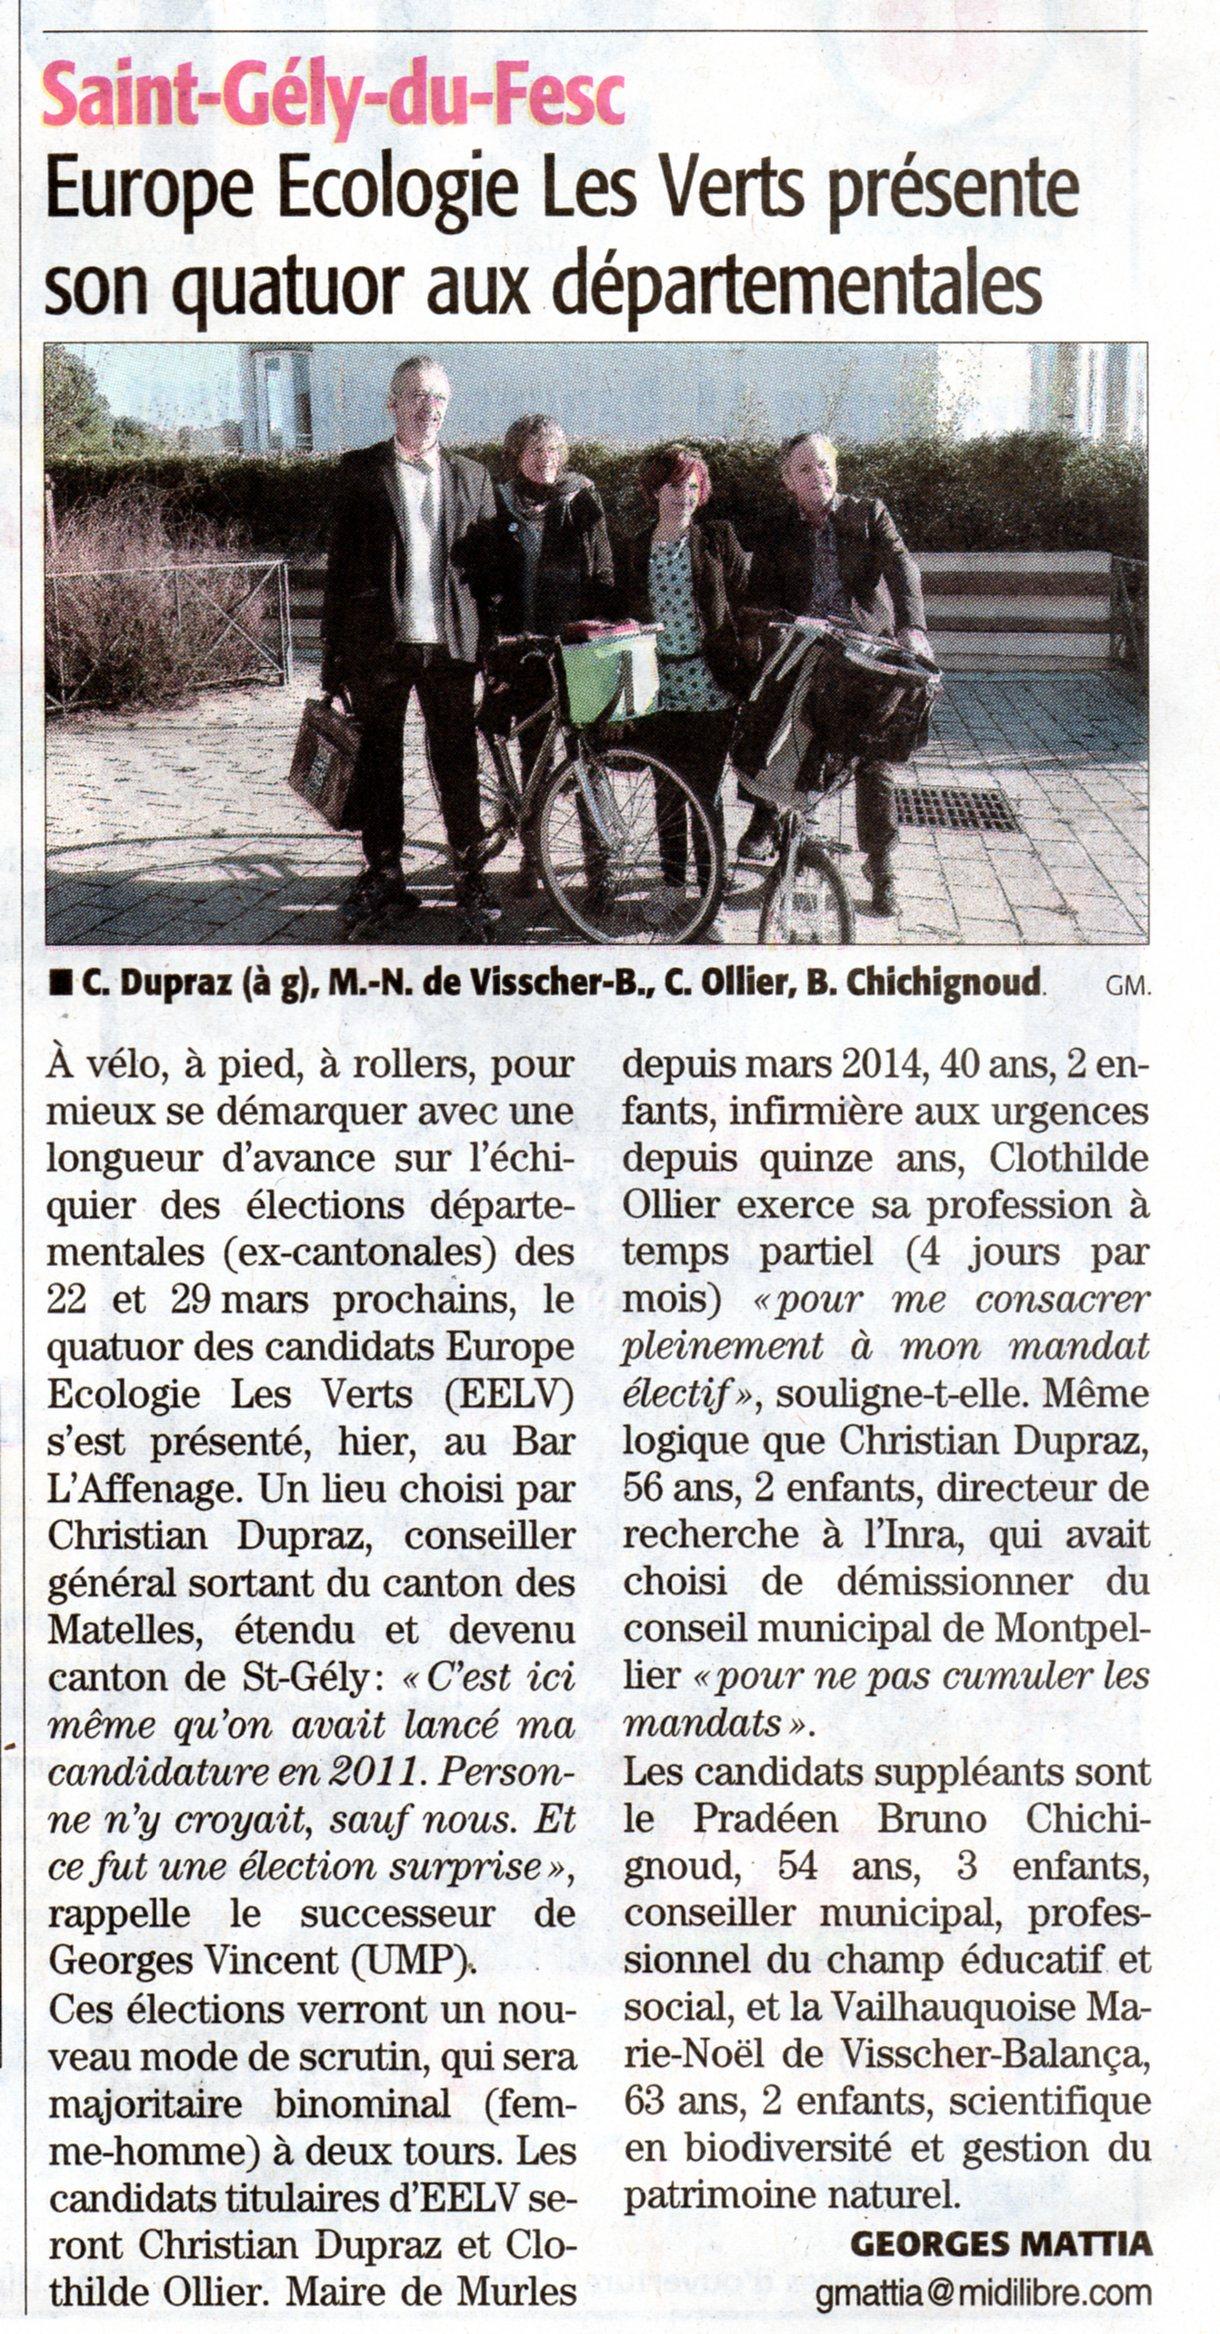 Midilibre 13 01 2015 Lancement campagne EELV SaintGely